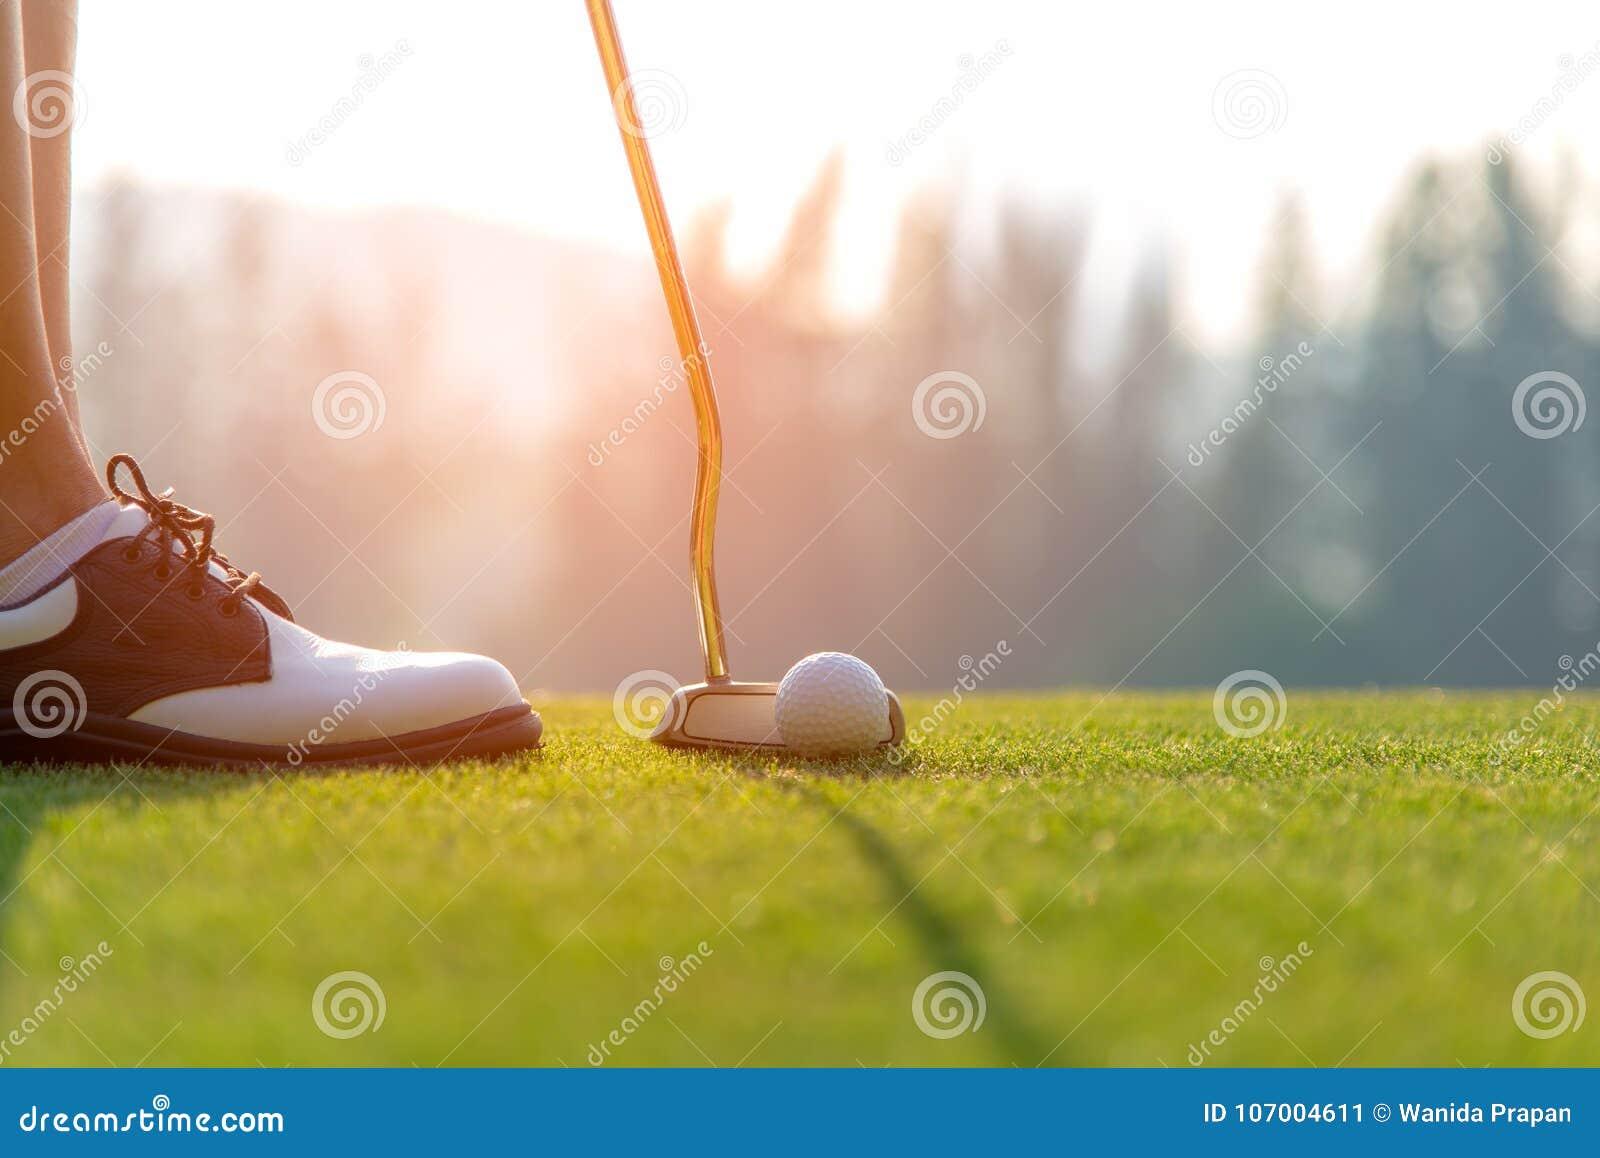 Golfer asian woman putting golf ball on the green golf on sun set evening time.